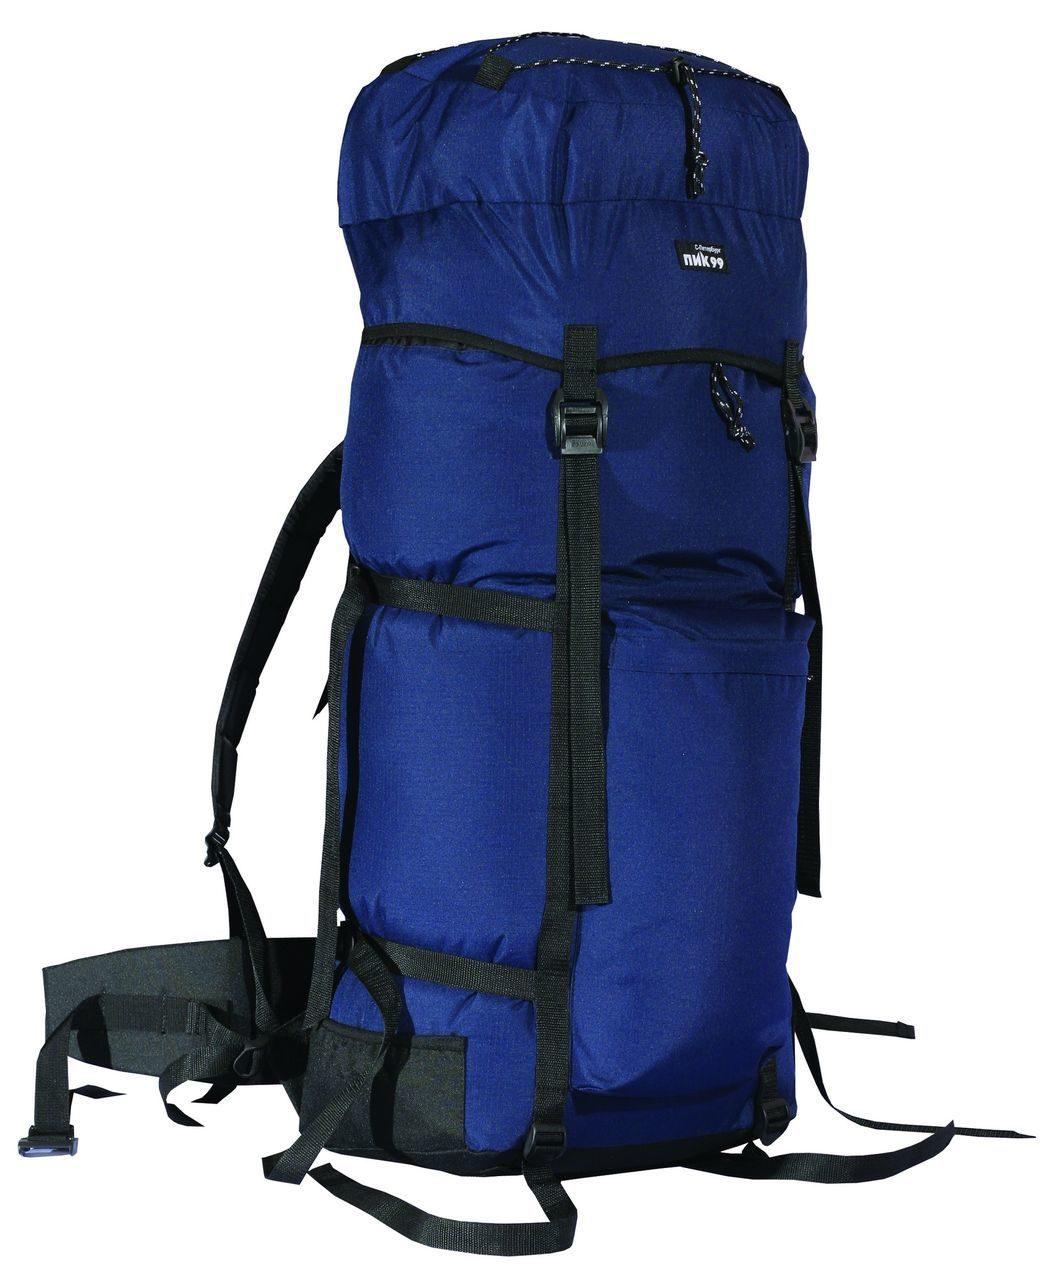 Рюкзаки туристические распродажа дешево рюкзаки скетчерс